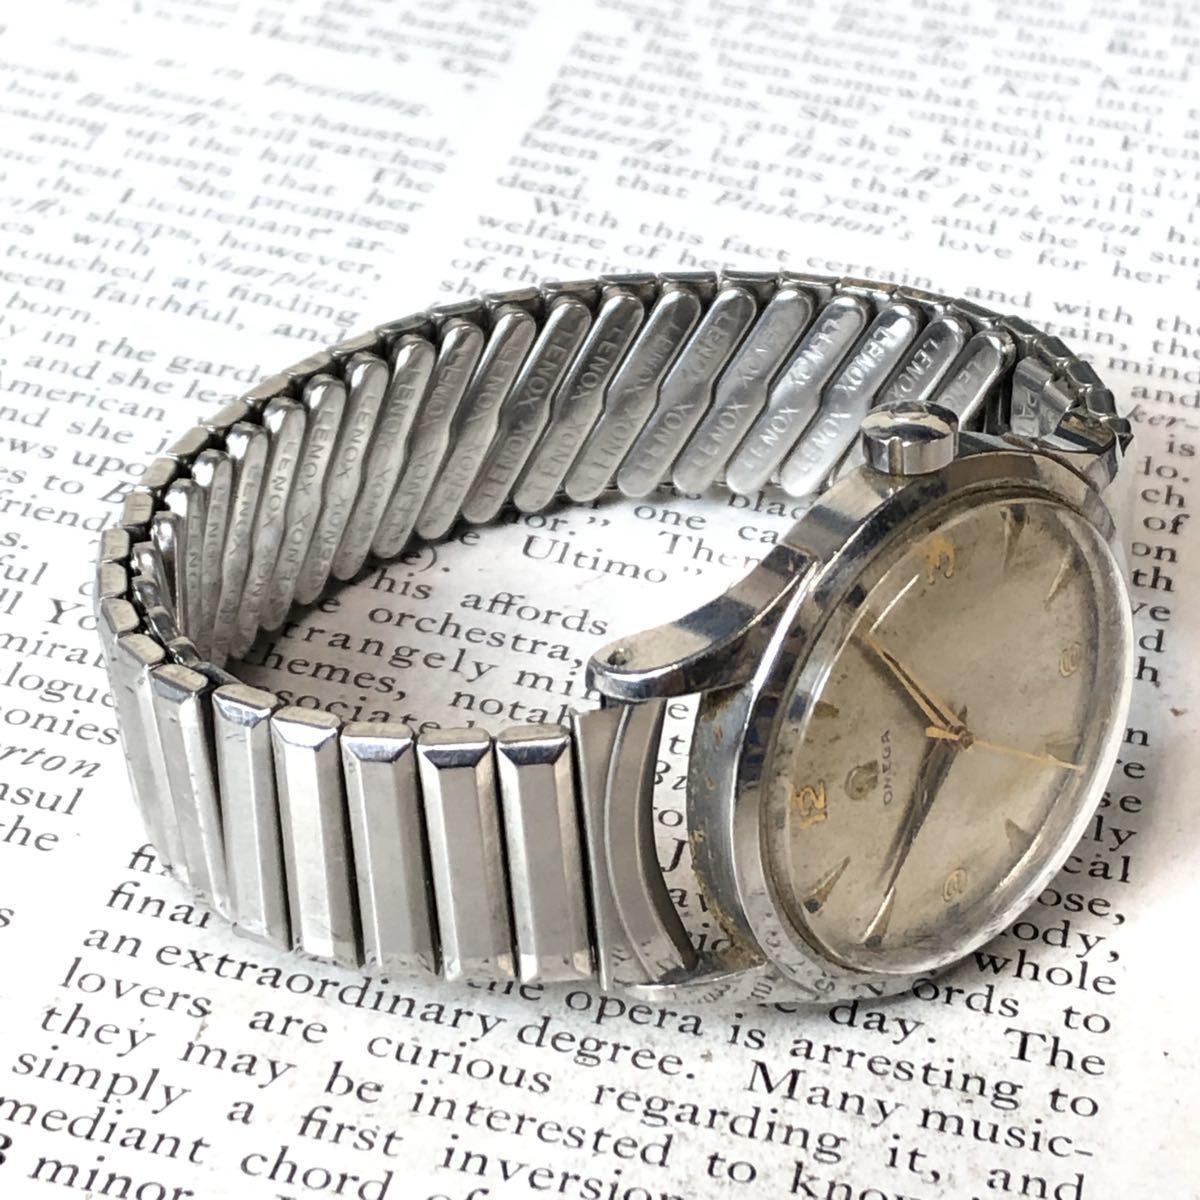 OMEGA オメガ 腕時計 機械式 自動巻 ハーフロータリー SWISS MADE スイス SS 3針 ビンテージ 希少 値下げ交渉あり 稼動品 W1519_画像3